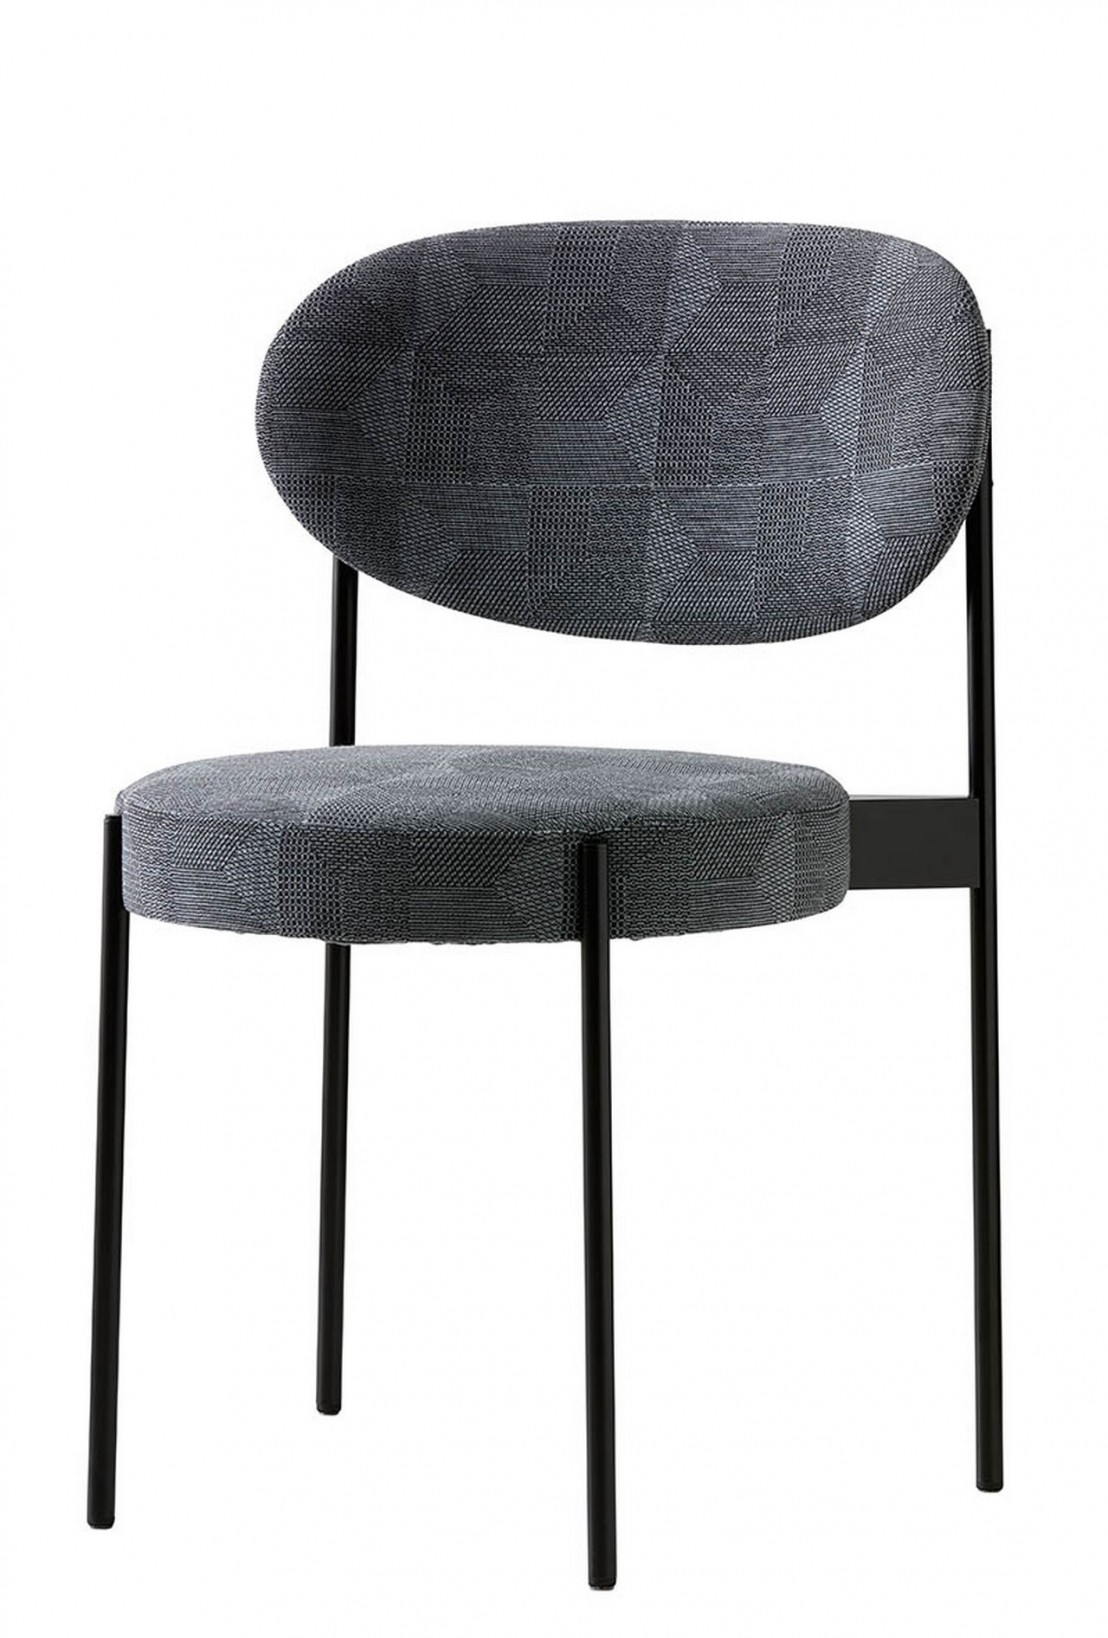 table ronde noire chaises verpan serie 430 lampe fun 11dm. Black Bedroom Furniture Sets. Home Design Ideas